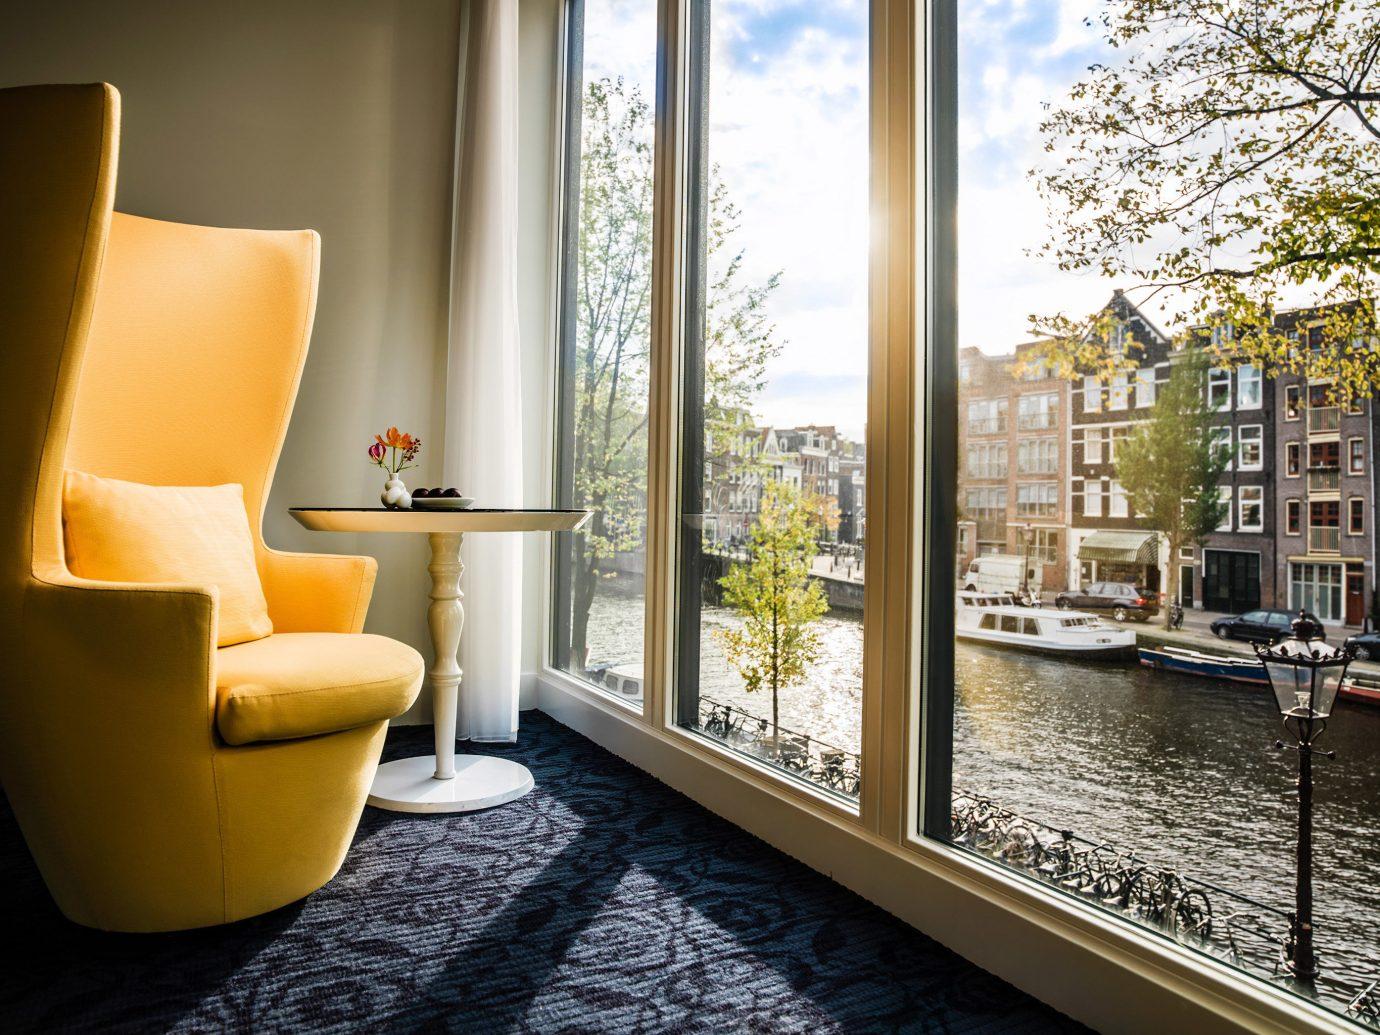 Amsterdam Boutique Hotels Hip Hotels Living Lounge Luxury Modern The Netherlands property room indoor floor home interior design living room condominium estate Design Lobby window flooring apartment furniture